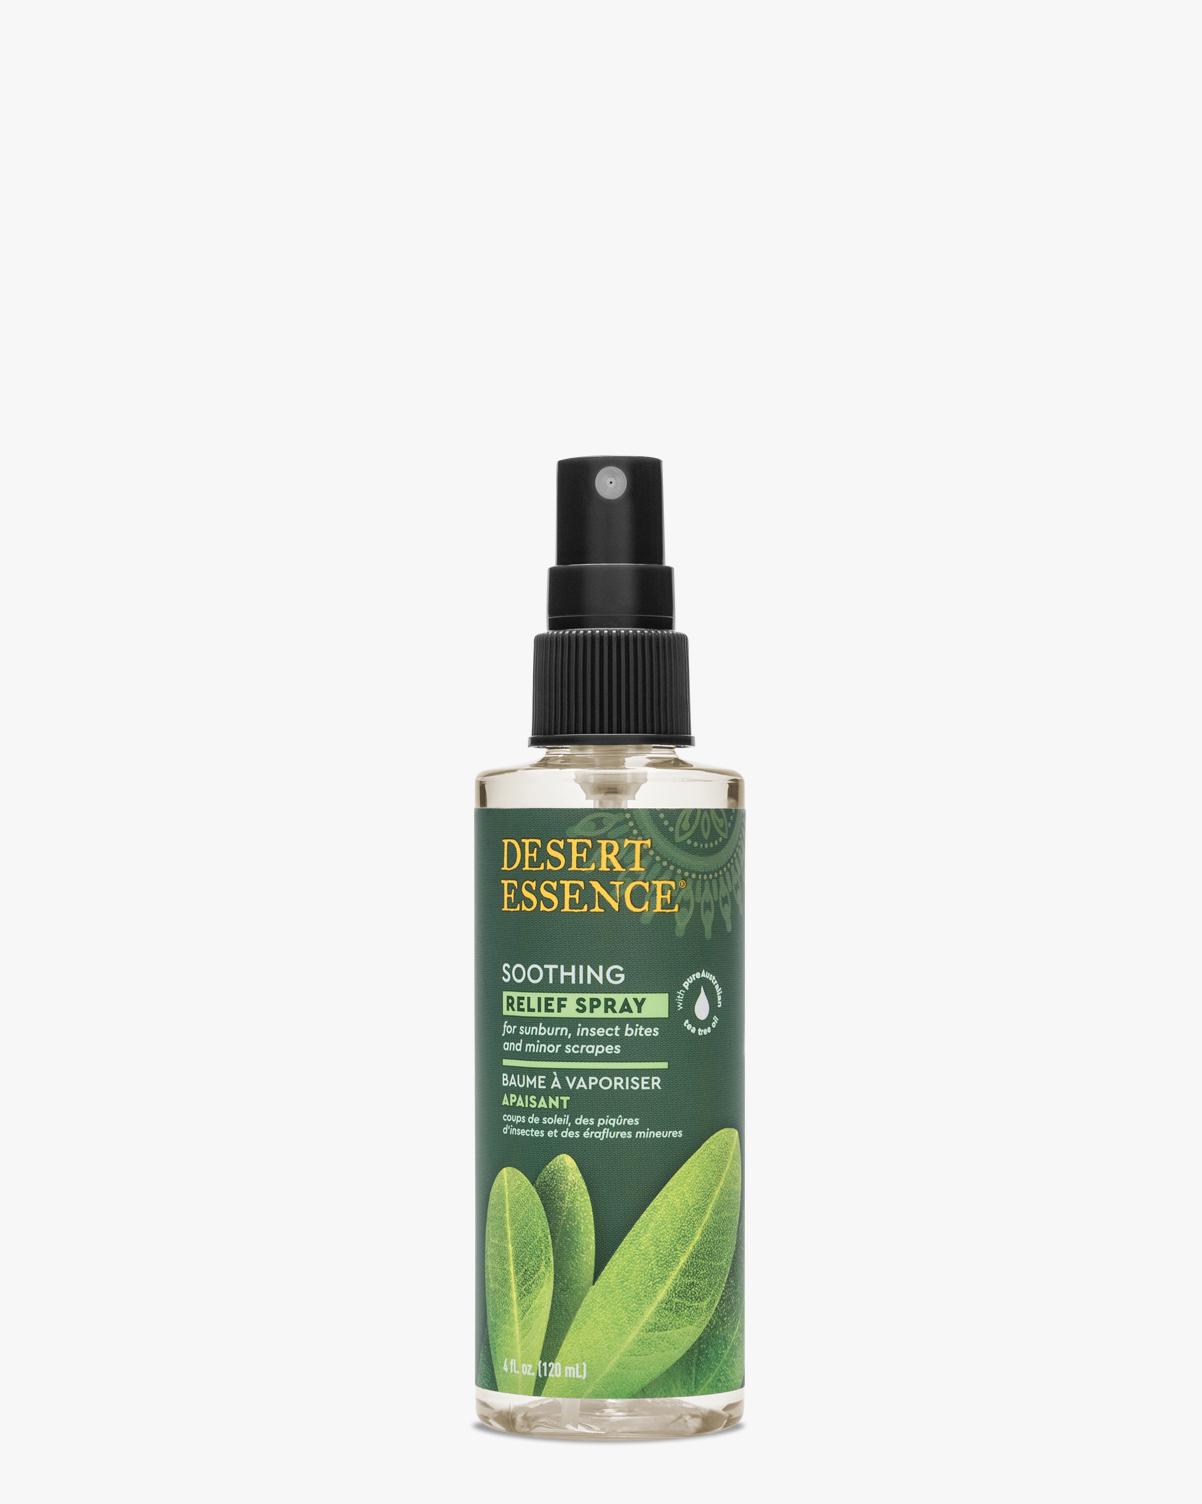 Desert Essence coupon: Desert Essence Tea Tree Oil Relief Spray, 4 fl. oz. | Vegan | Gluten-Free